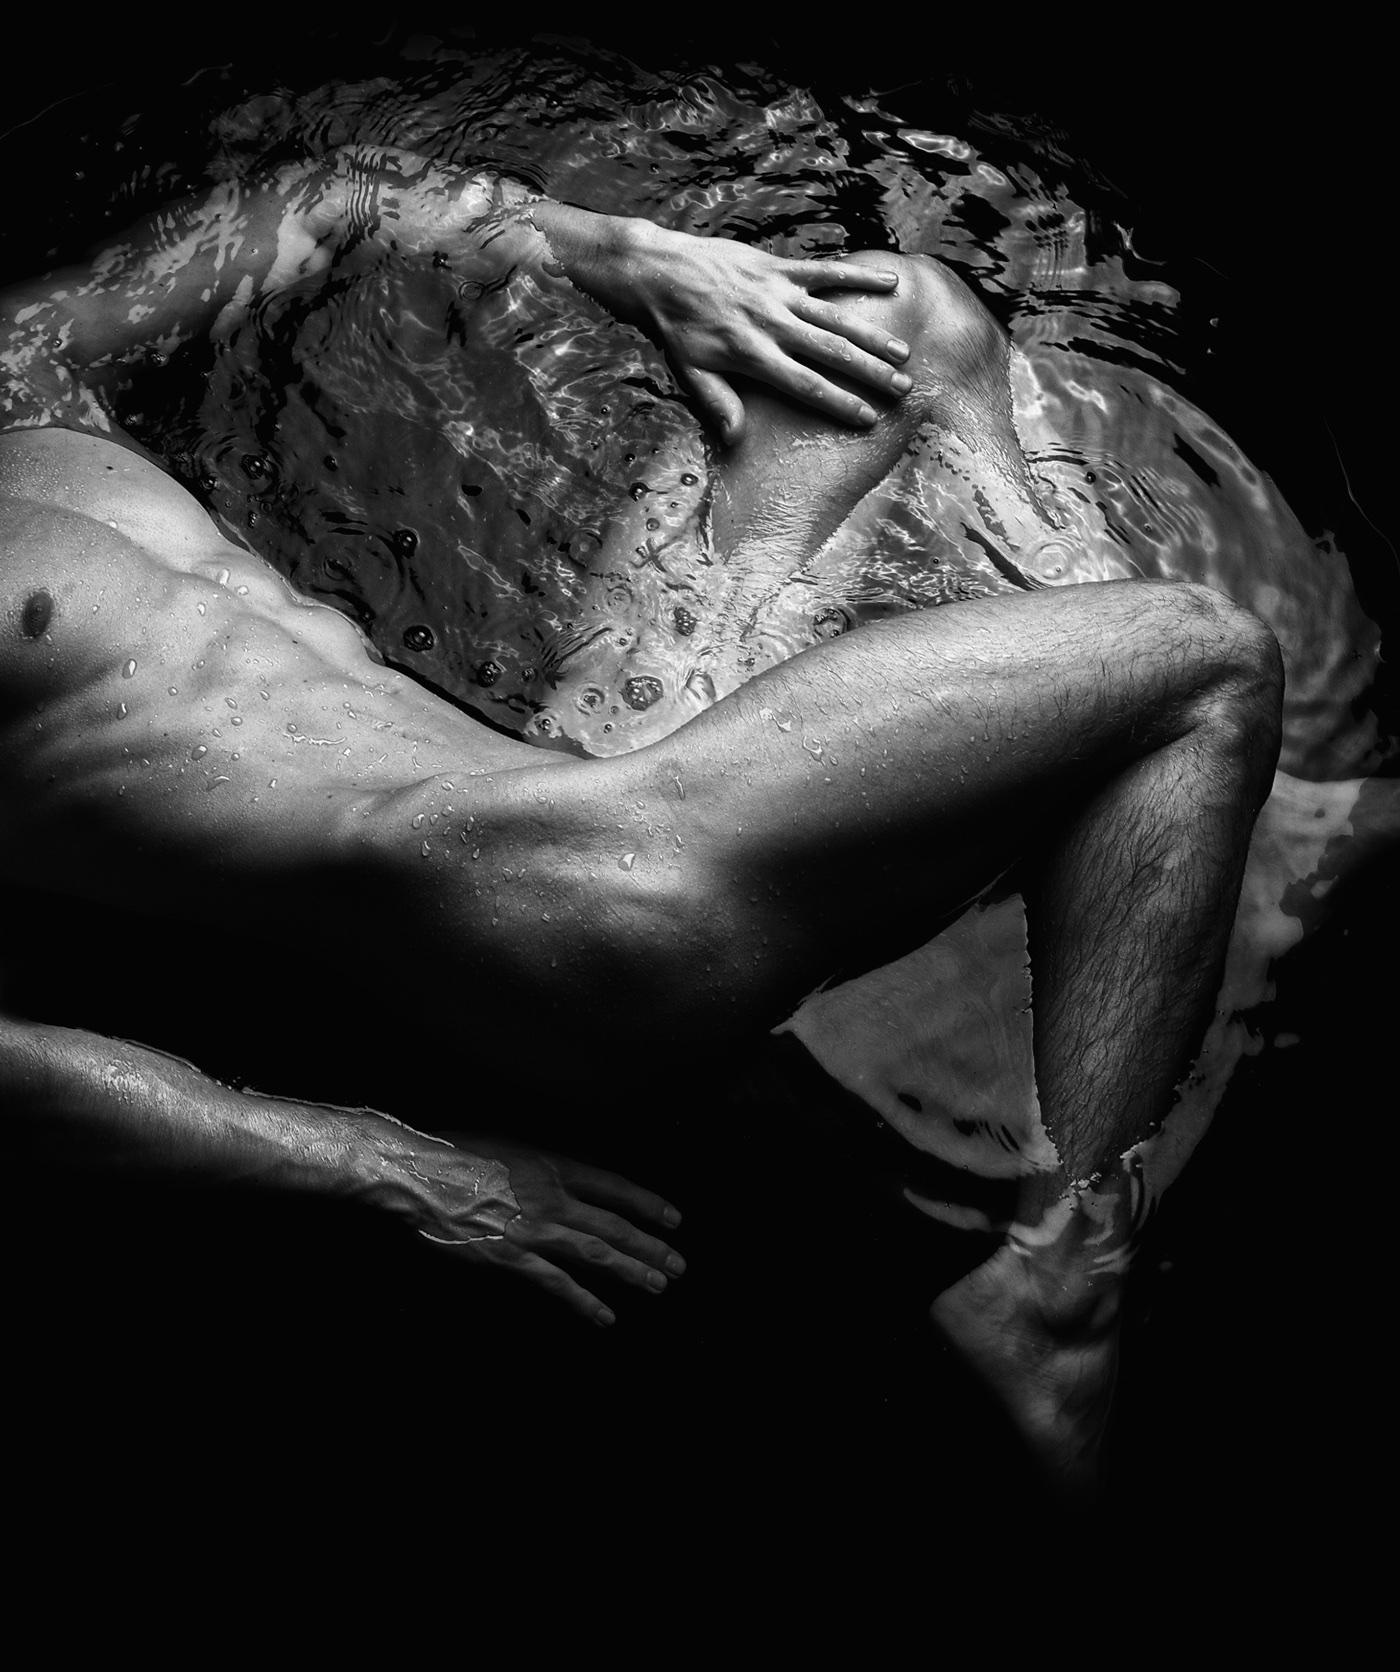 Male Nude, Self Portrait Photograph By Art Of Male Nude Josh Humble Model